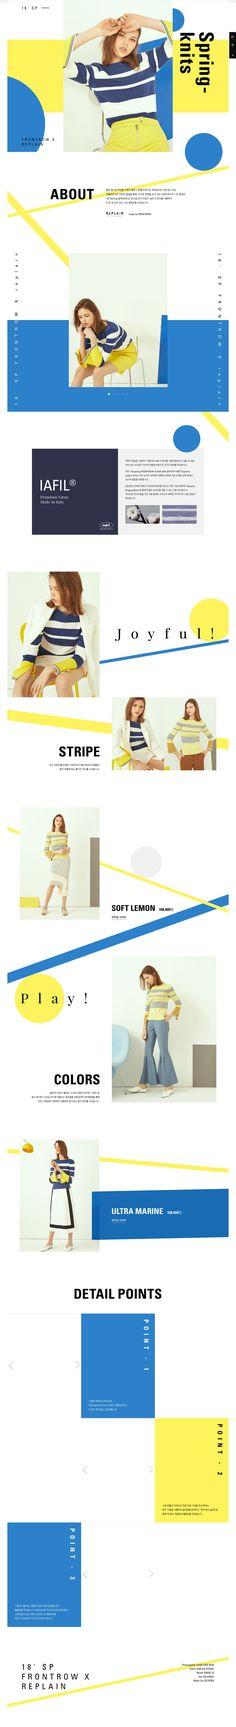 44 New Ideas Design Magazine Business Website Design Inspiration, Website Design Layout, Book Design Layout, Web Layout, Page Design, Design Logo, Email Design, Typography Design, Grid Web Design